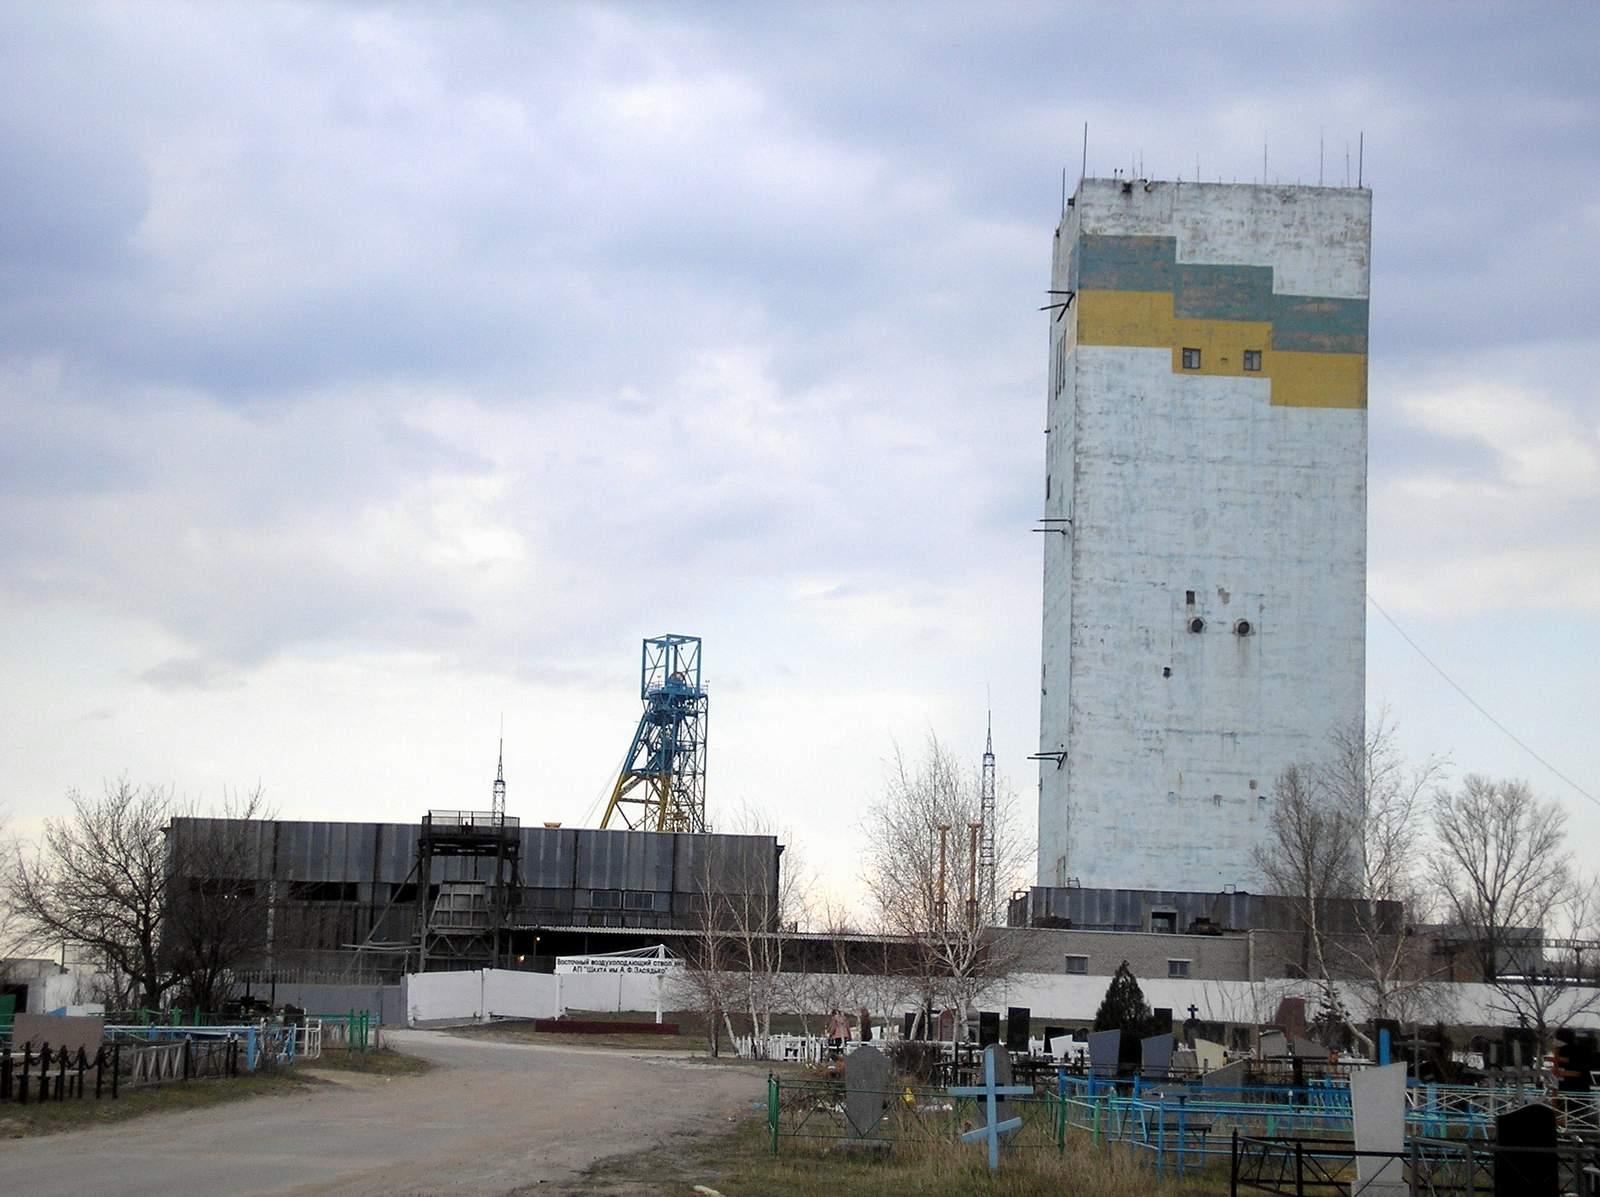 BBC: Gas blast 'kills 33' at Zasyadko coal mine